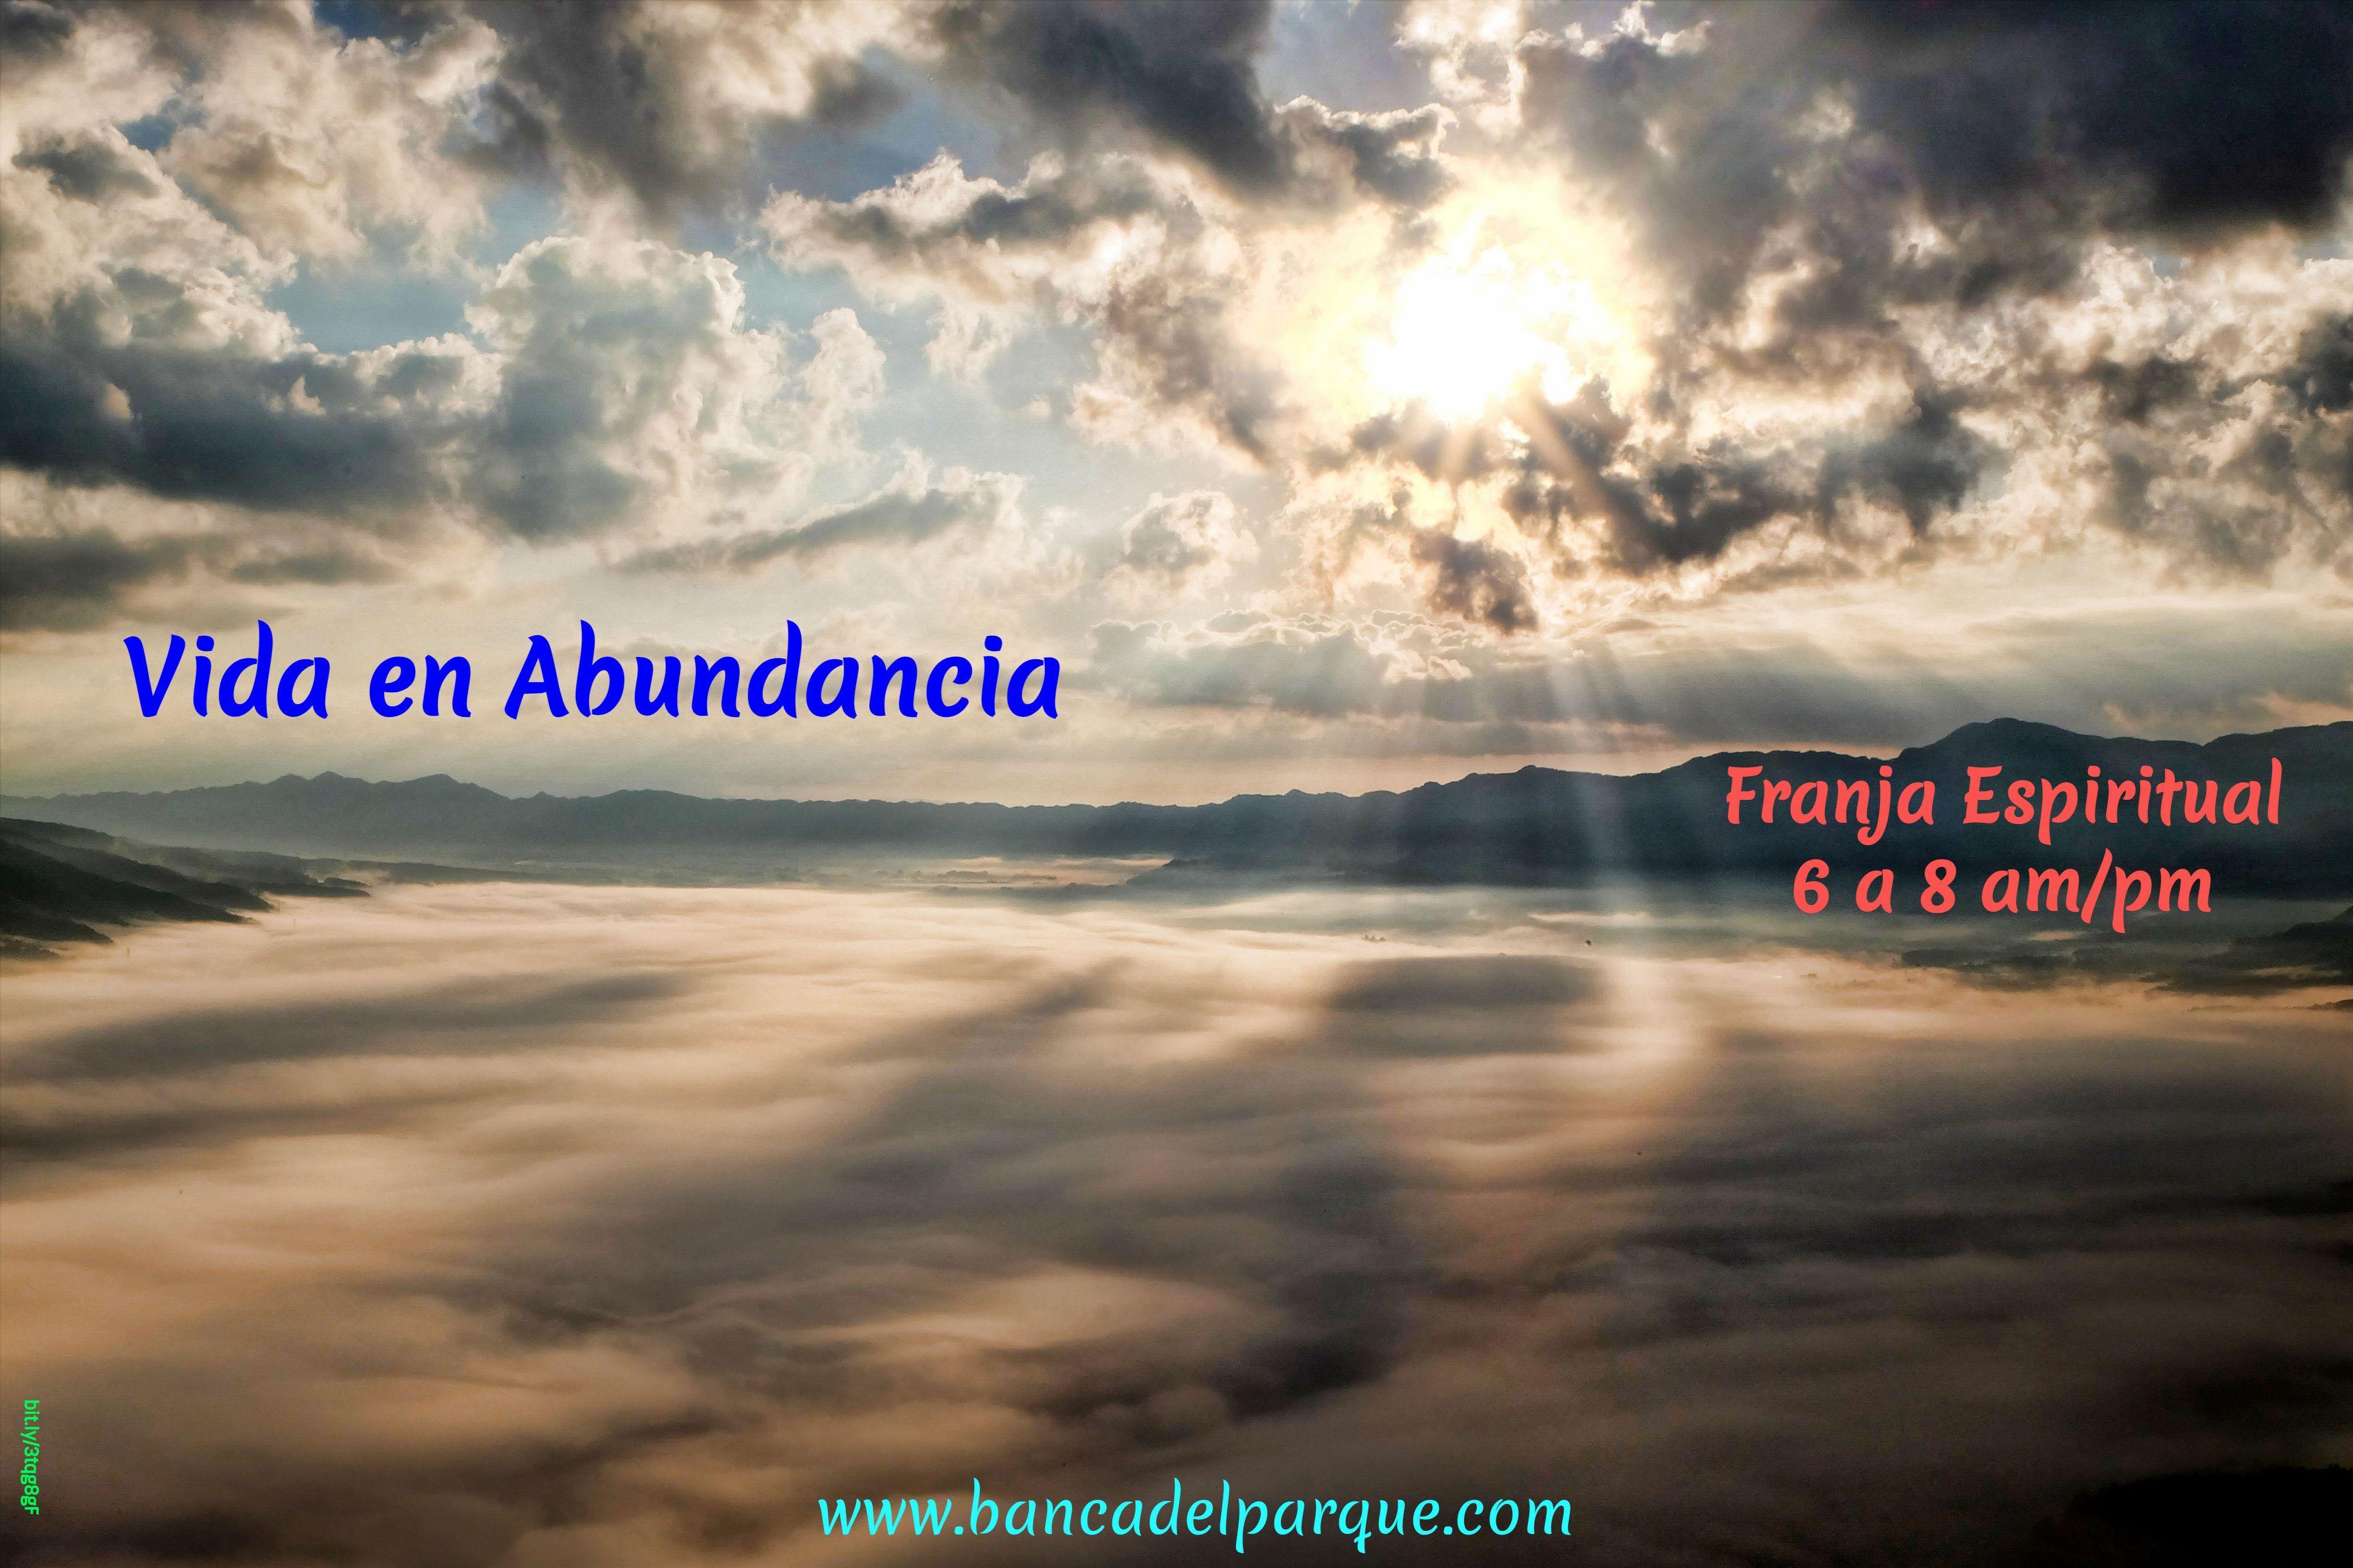 18.04.2021 - Vida en Abundancia